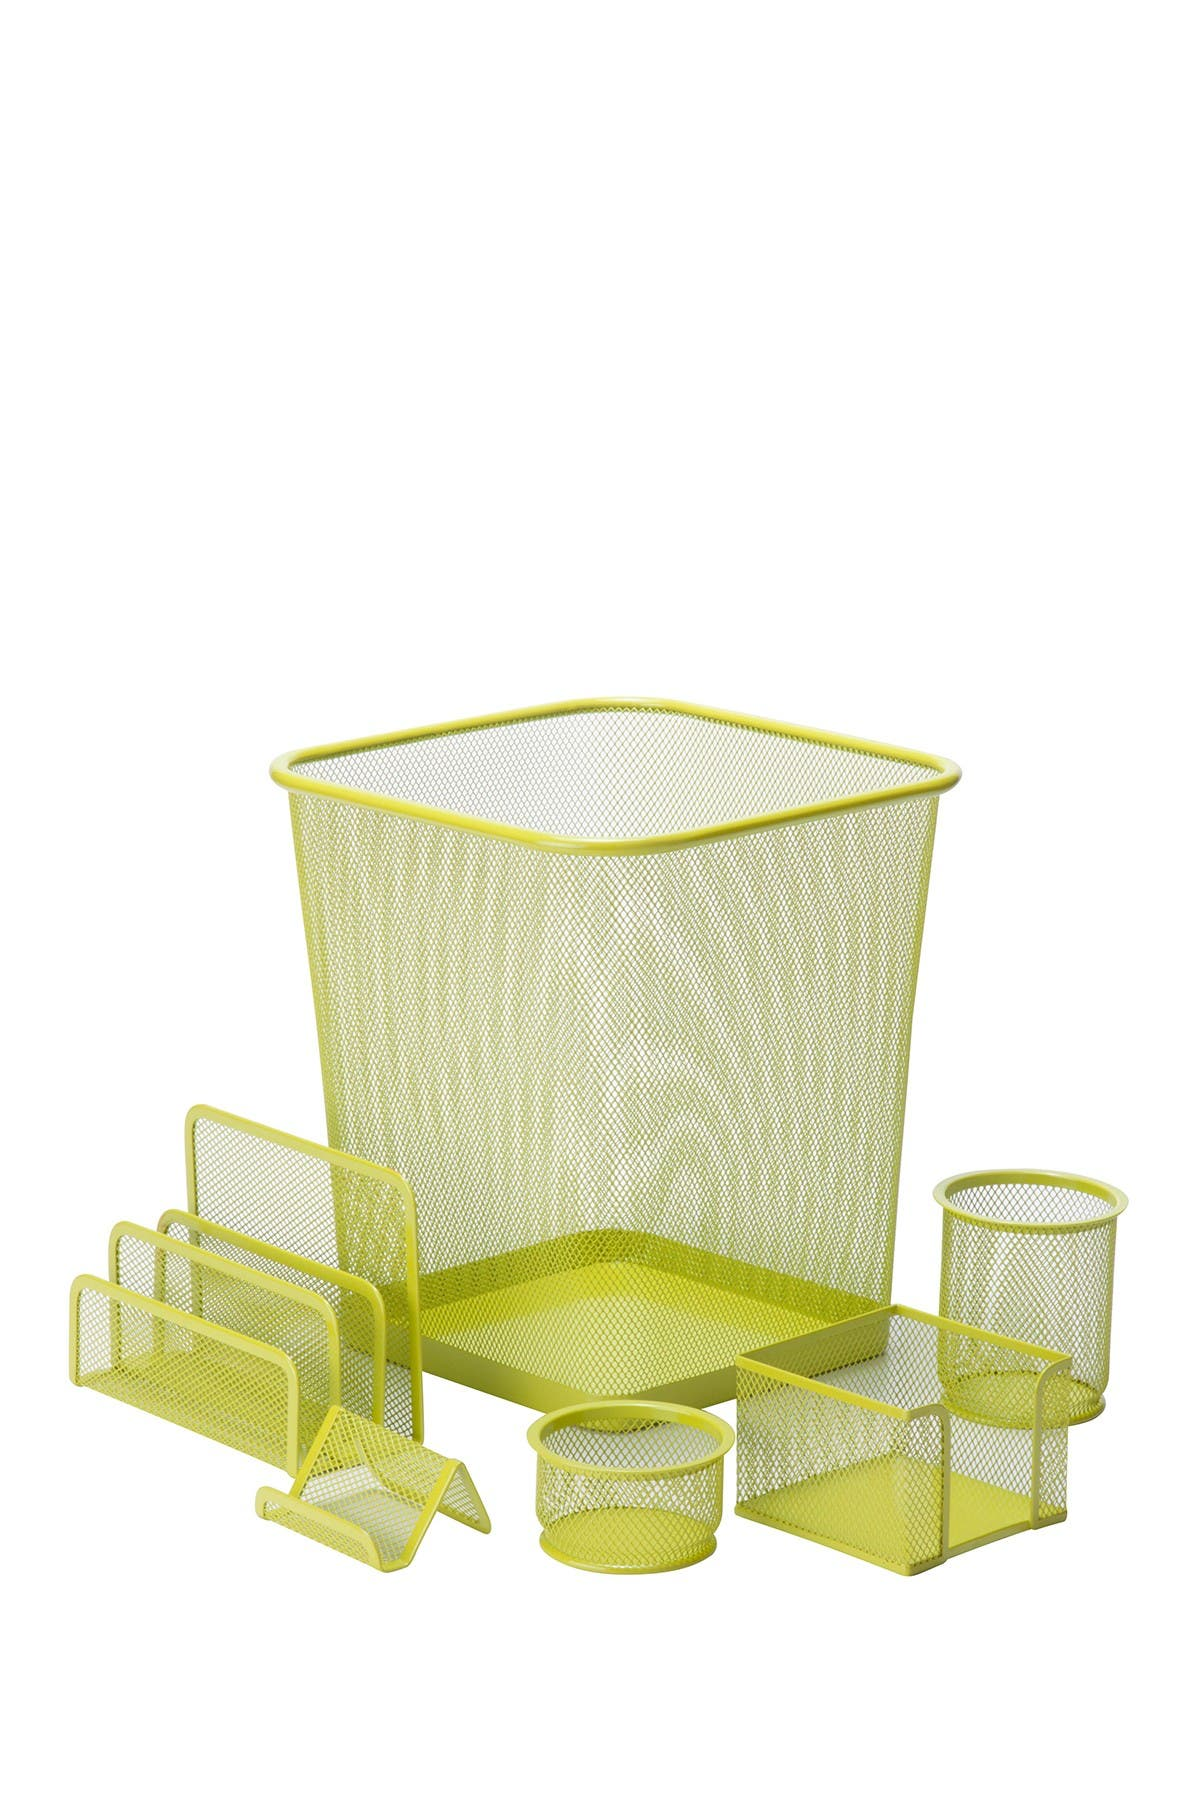 Image of Honey-Can-Do Lime 6-Piece Steel Mesh Desk Set